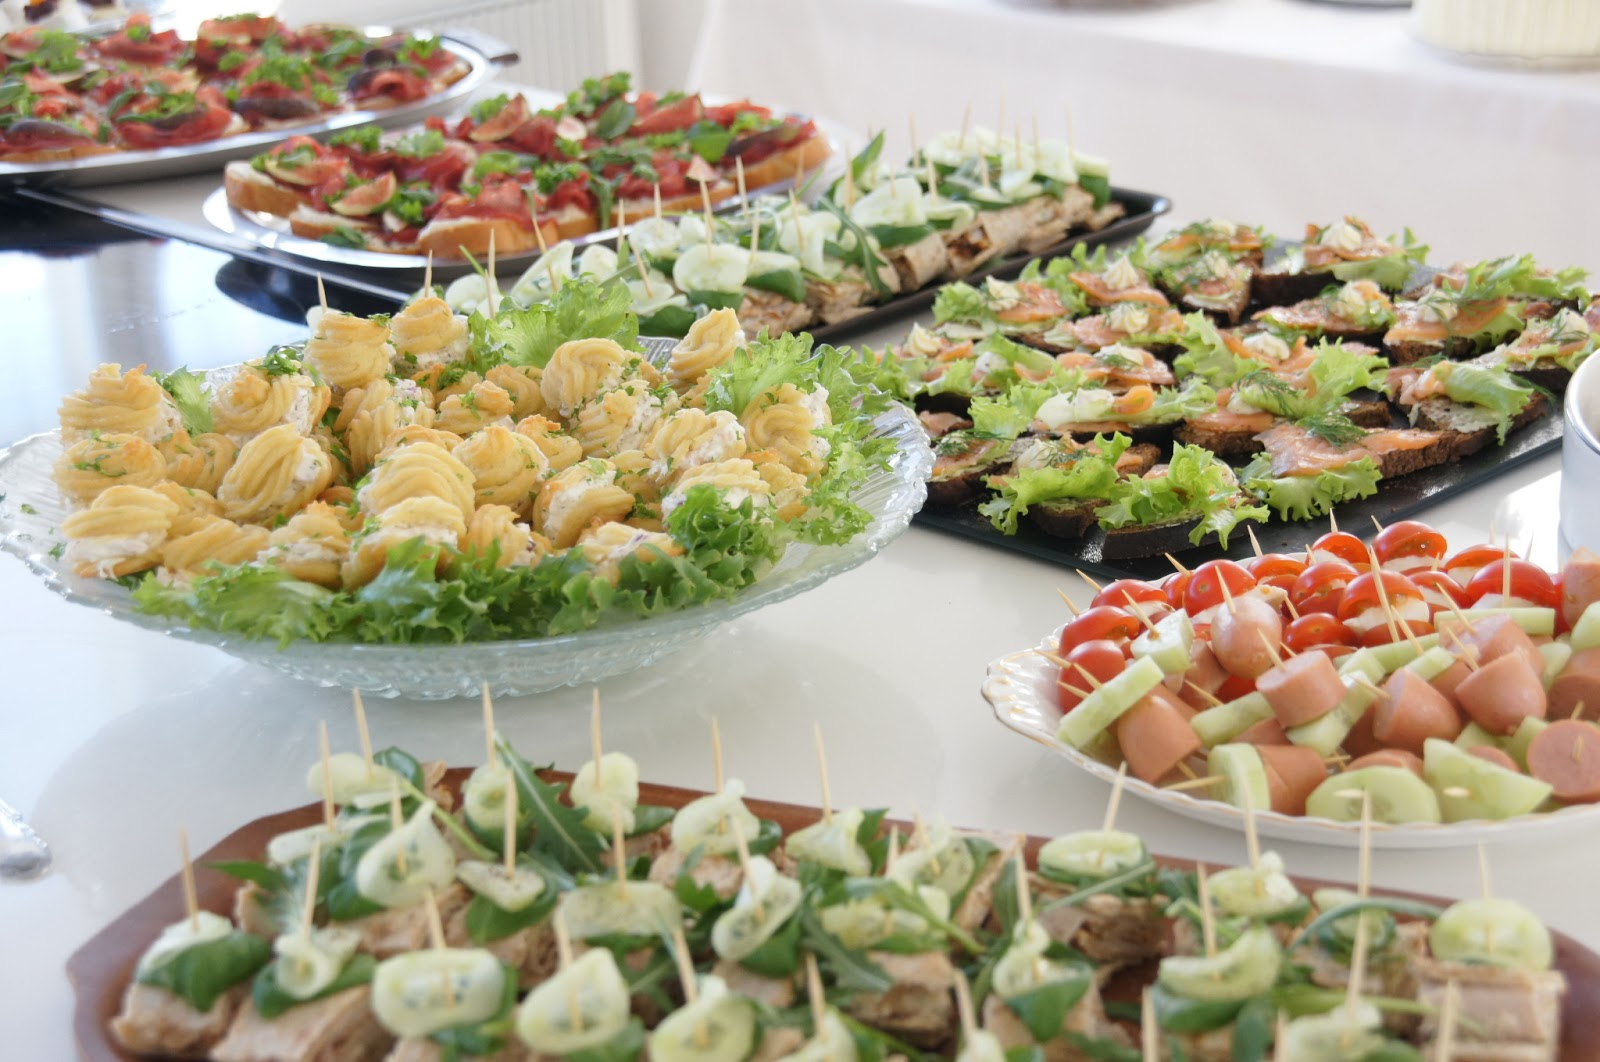 Helppo ruoka juhliin